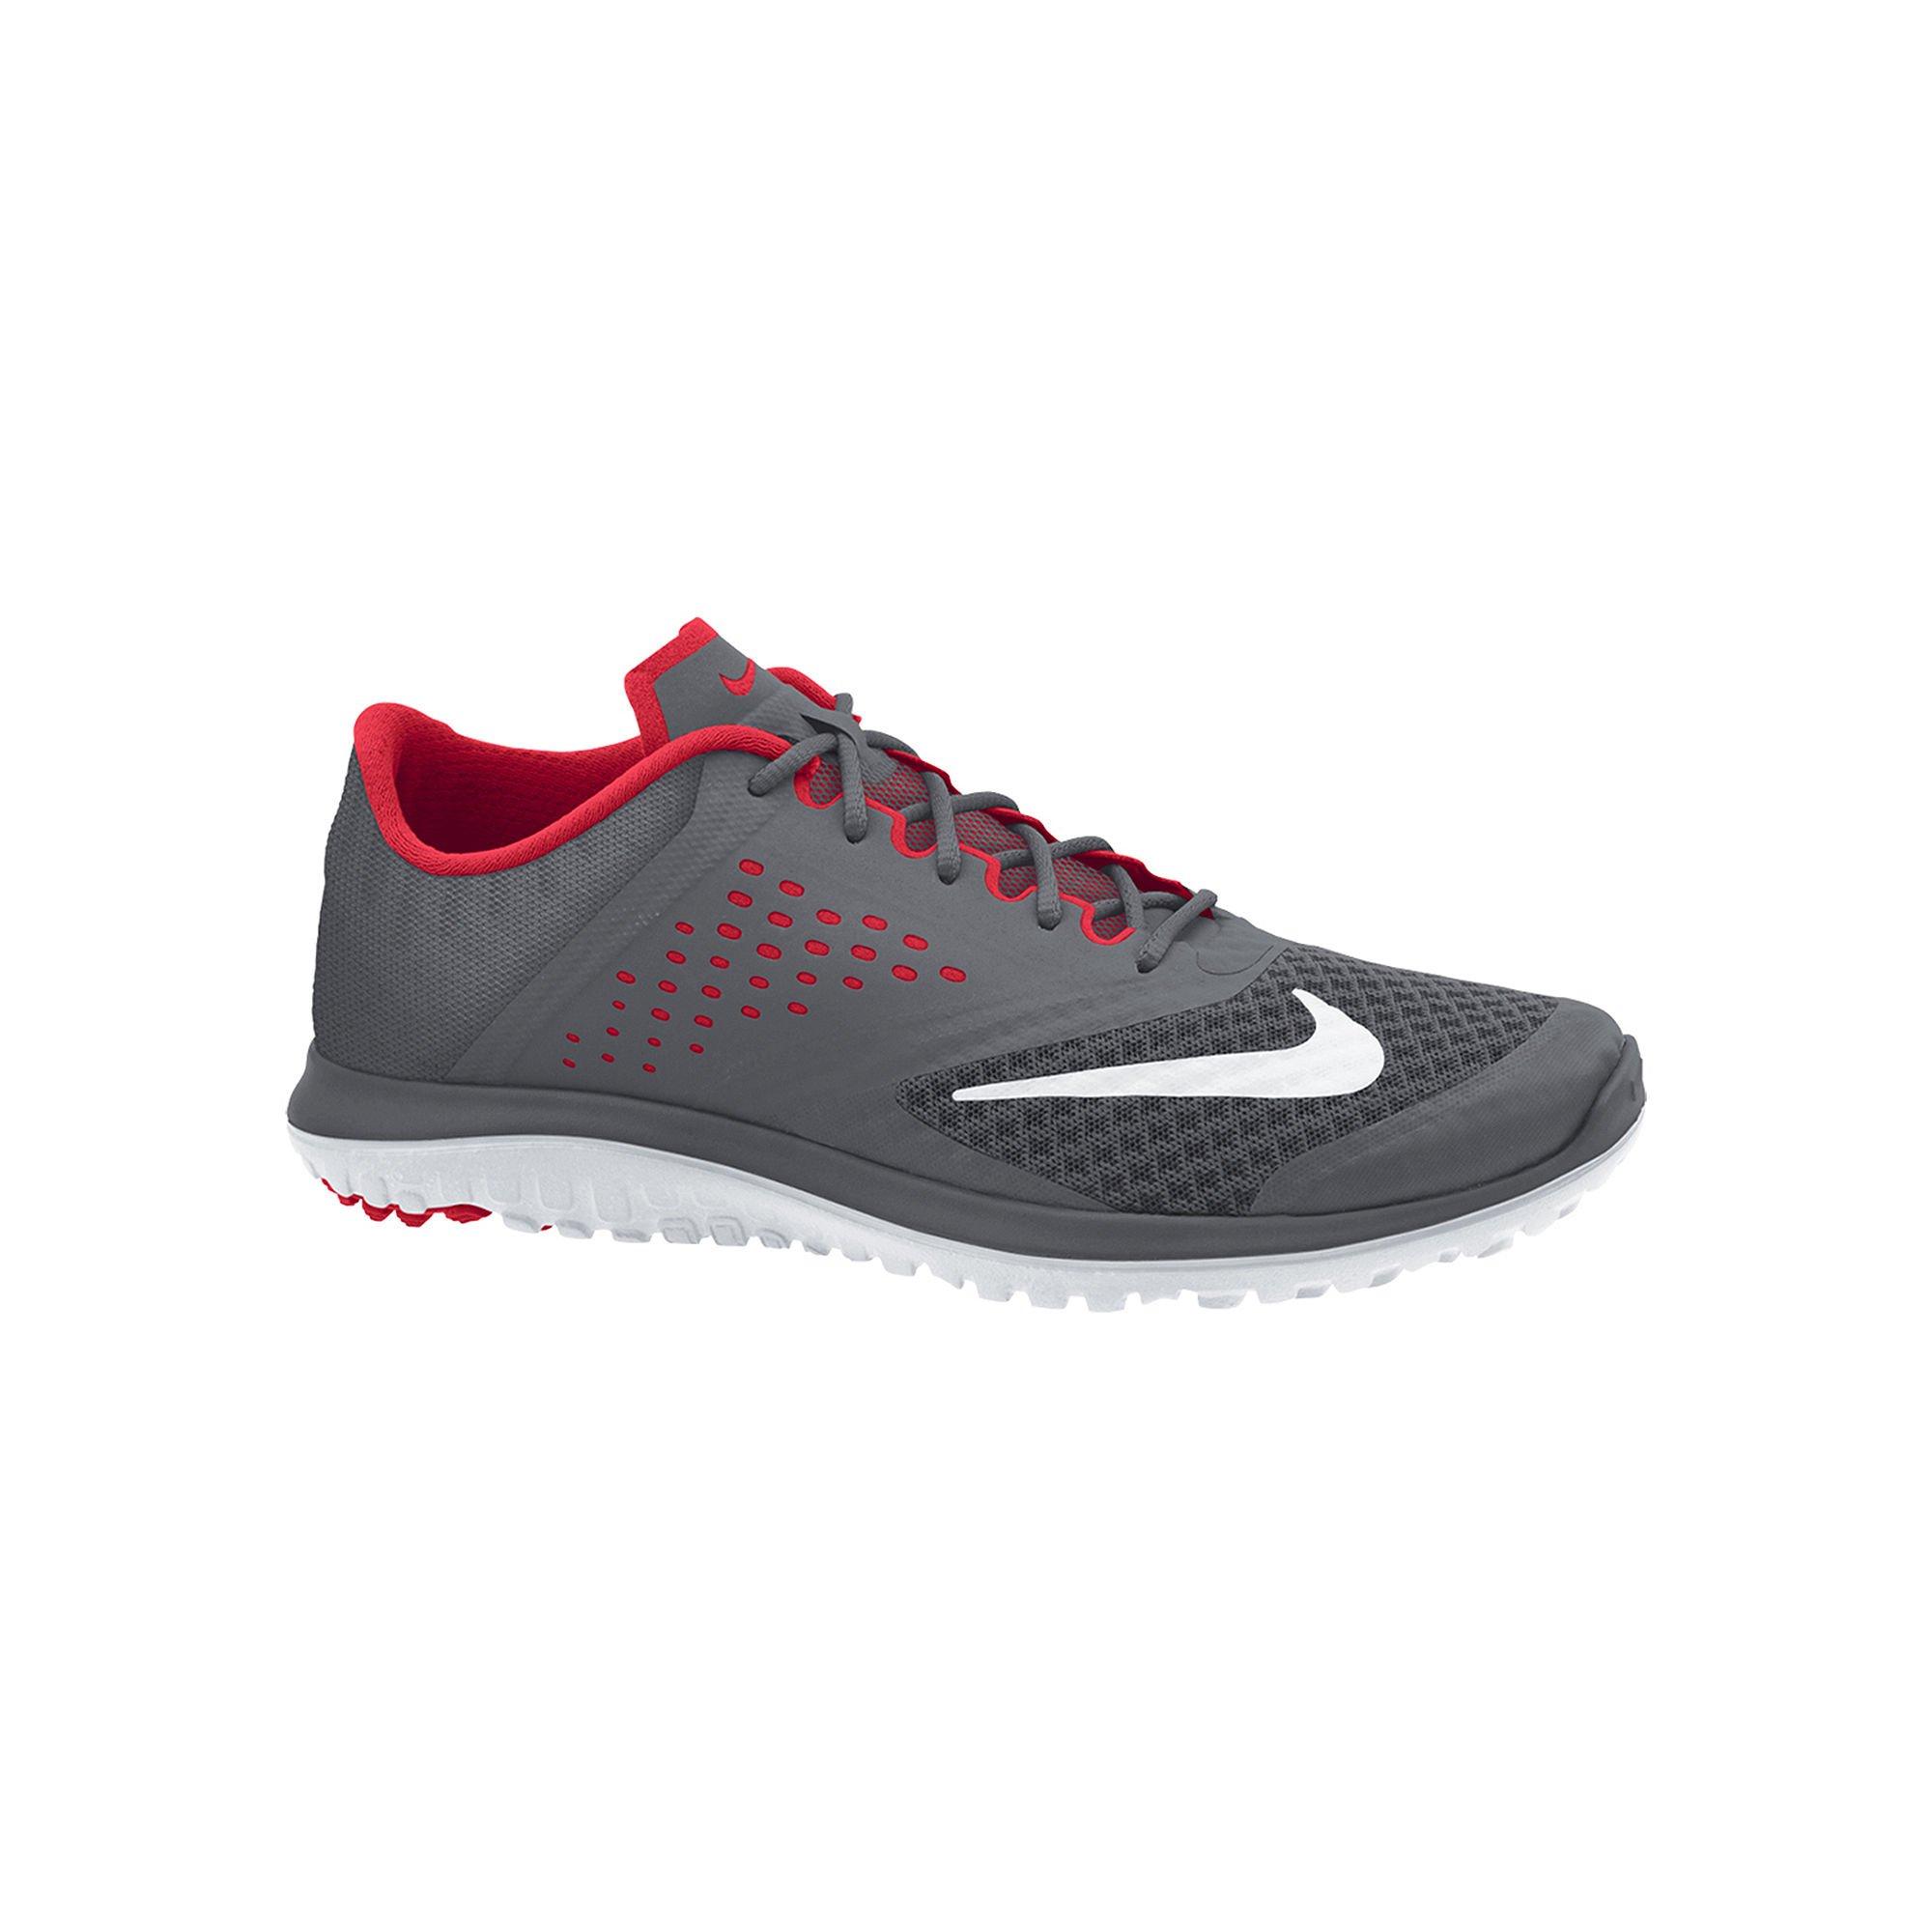 best service 09187 fd7d8 Galleon - NIKE Men s FS Lite Run 2 Shoe, Dark Grey White University Red, 8  D US